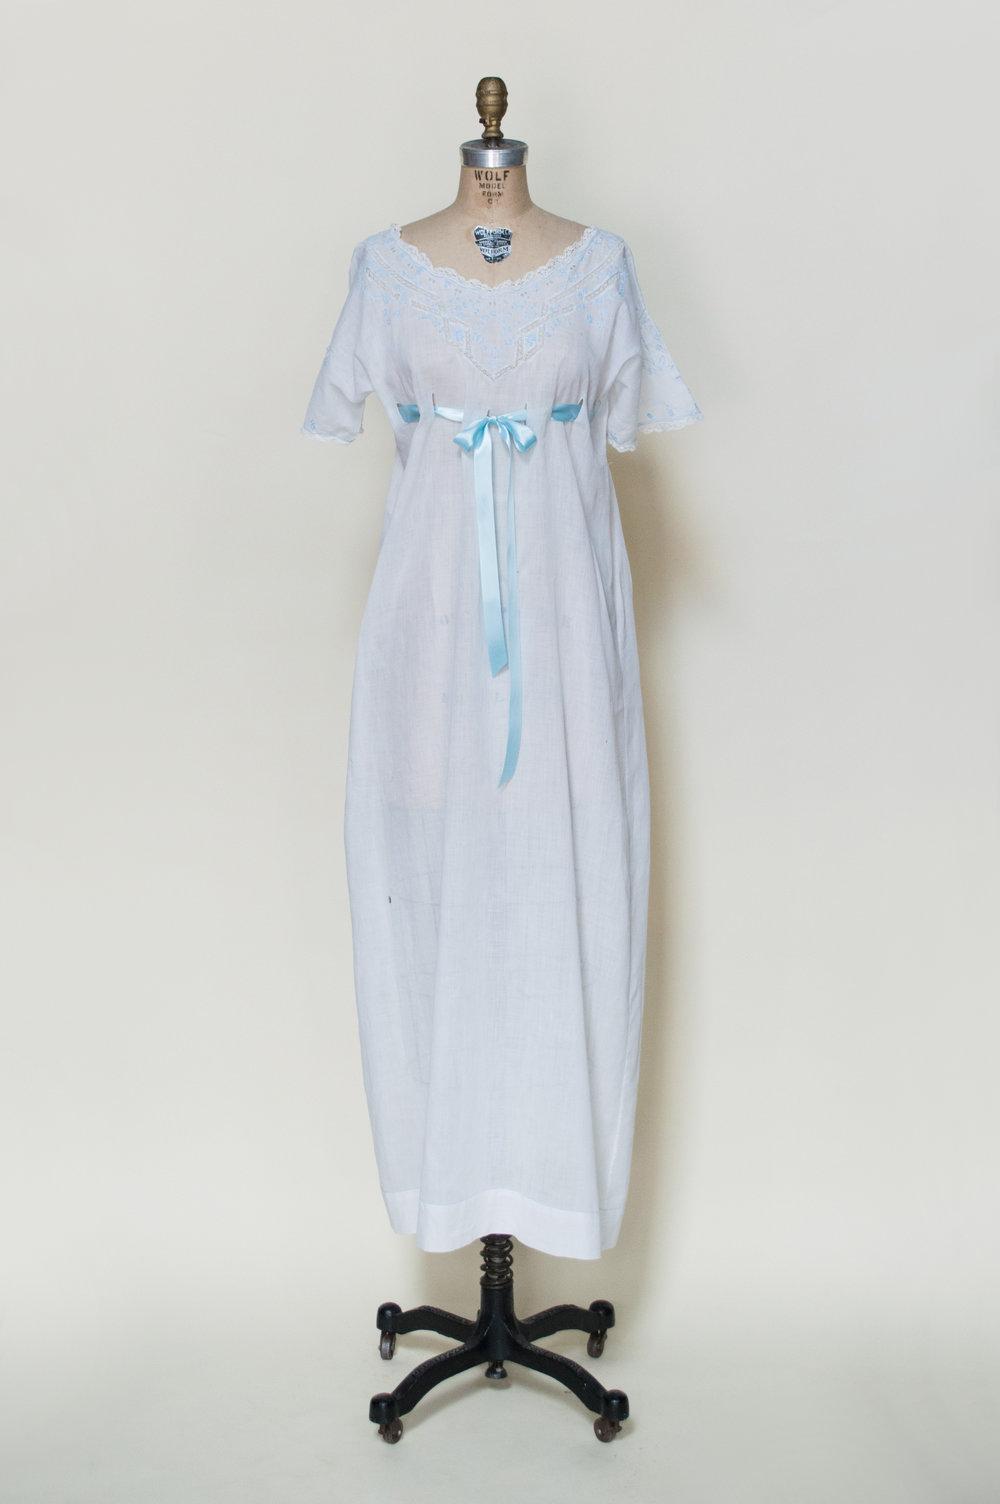 Edwardian Empire-Waist Nightgown